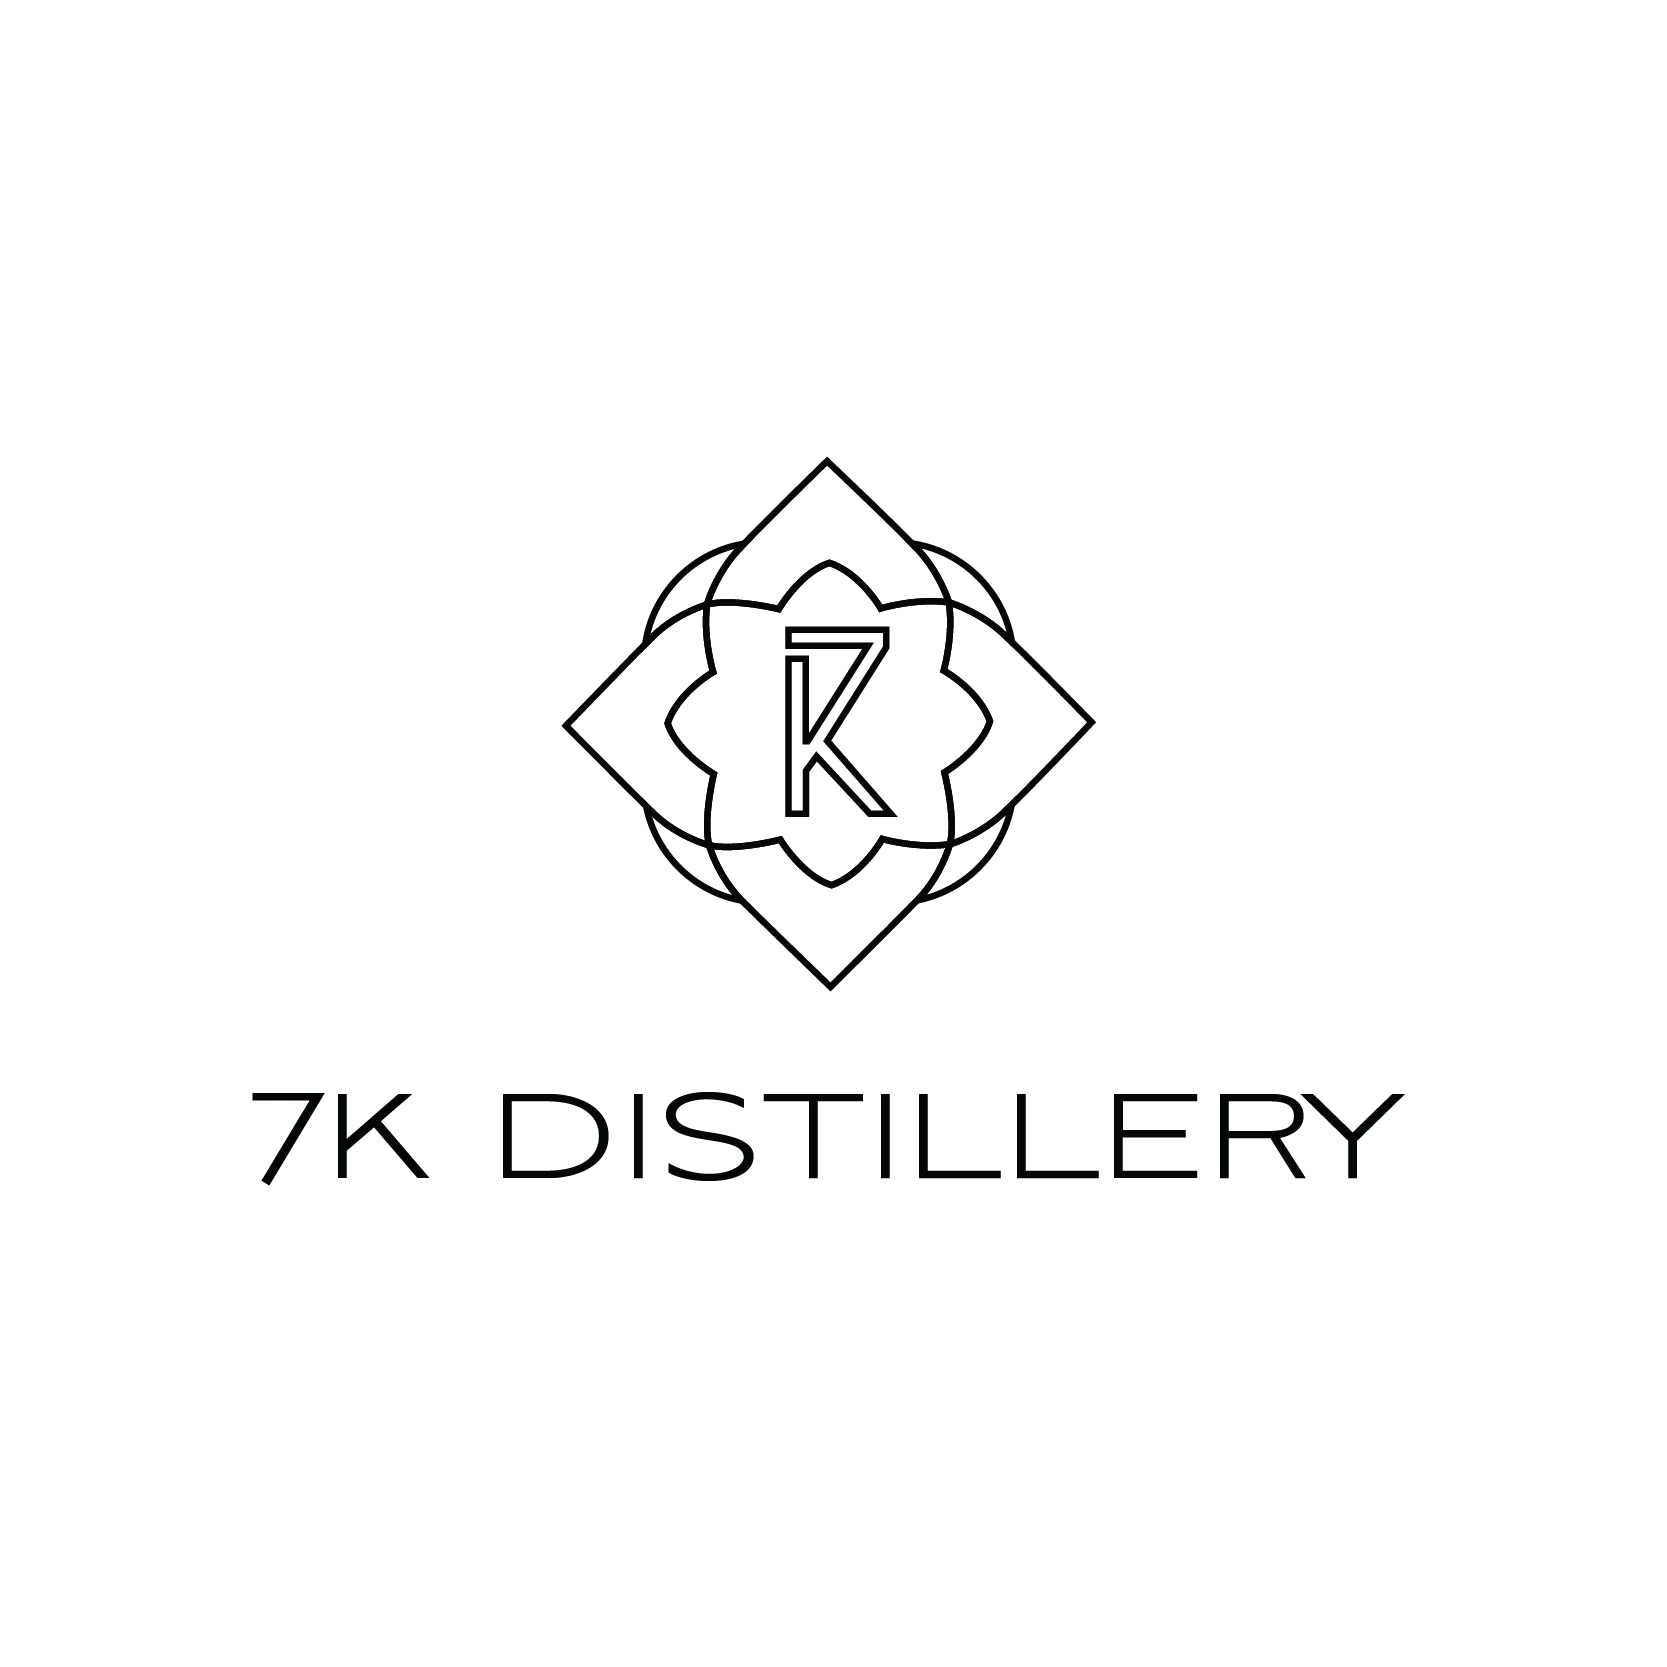 7K-Distillery-01-01.png